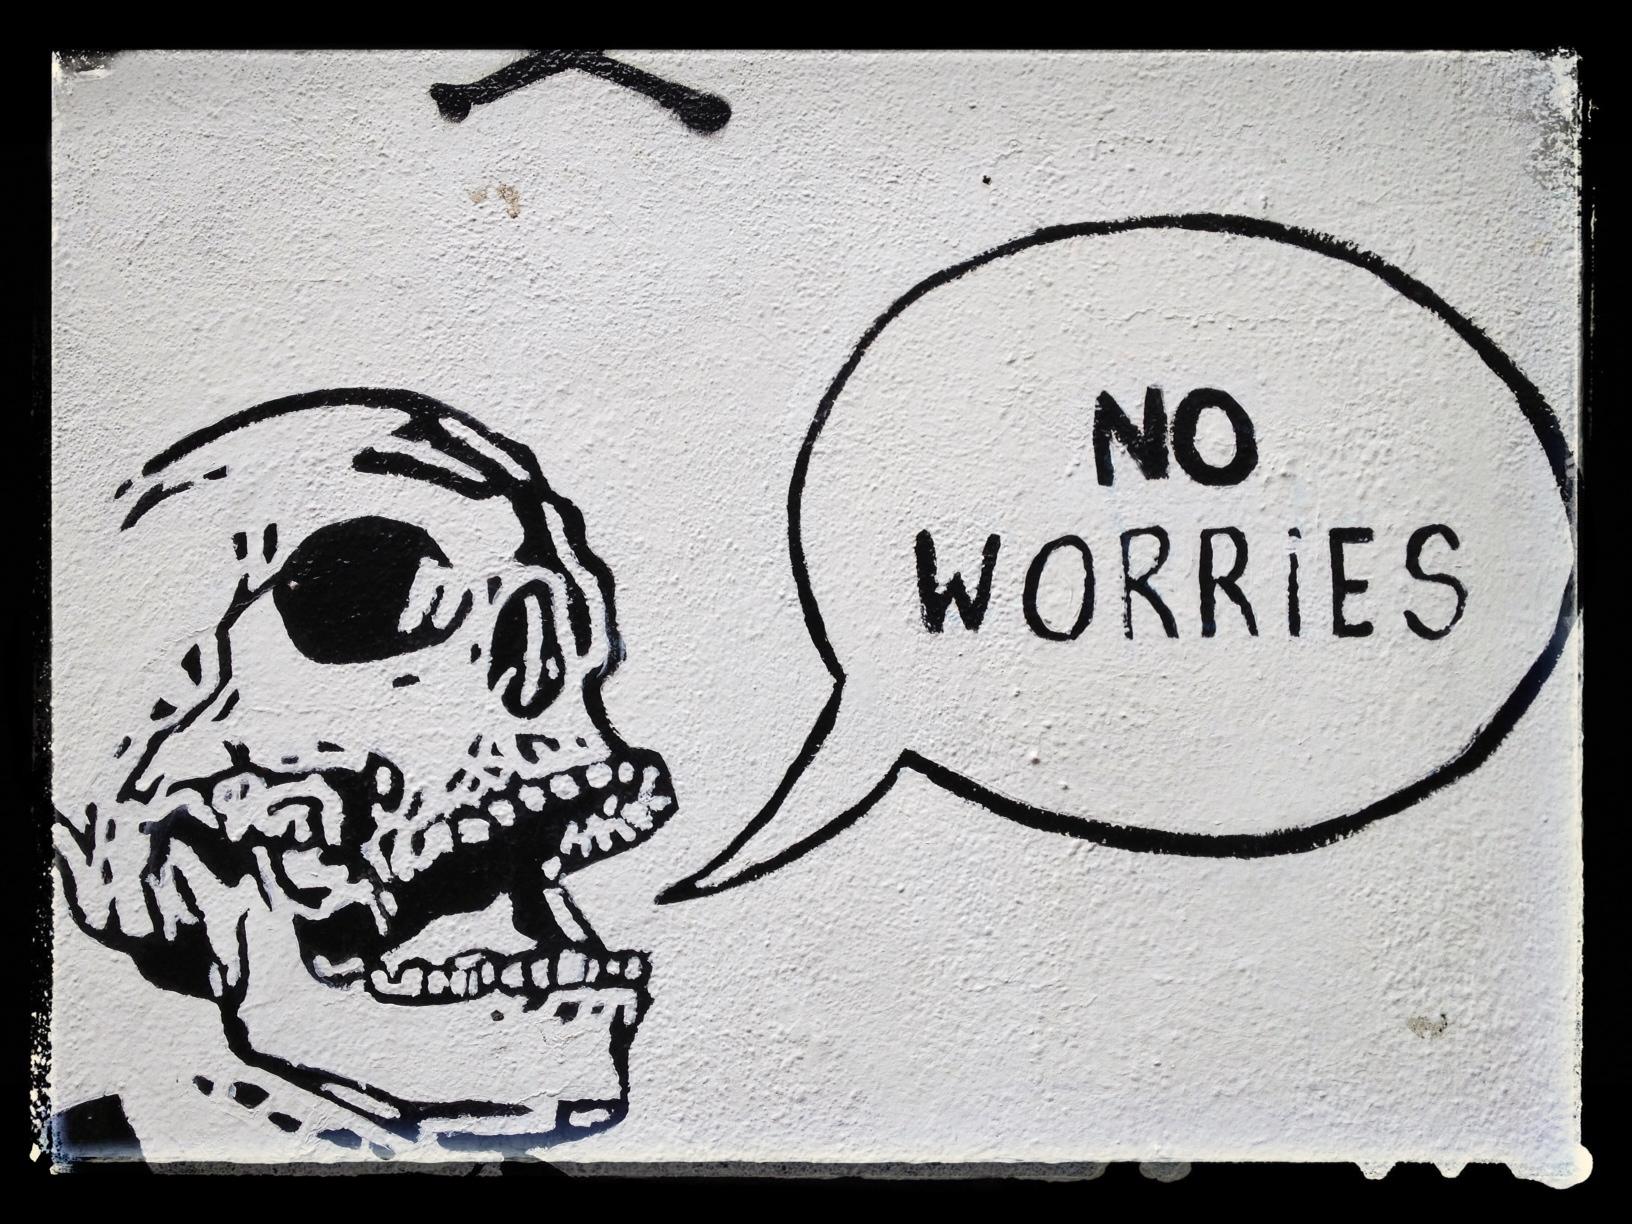 iPhone shot of some graffiti I found in Dublin, Ireland...